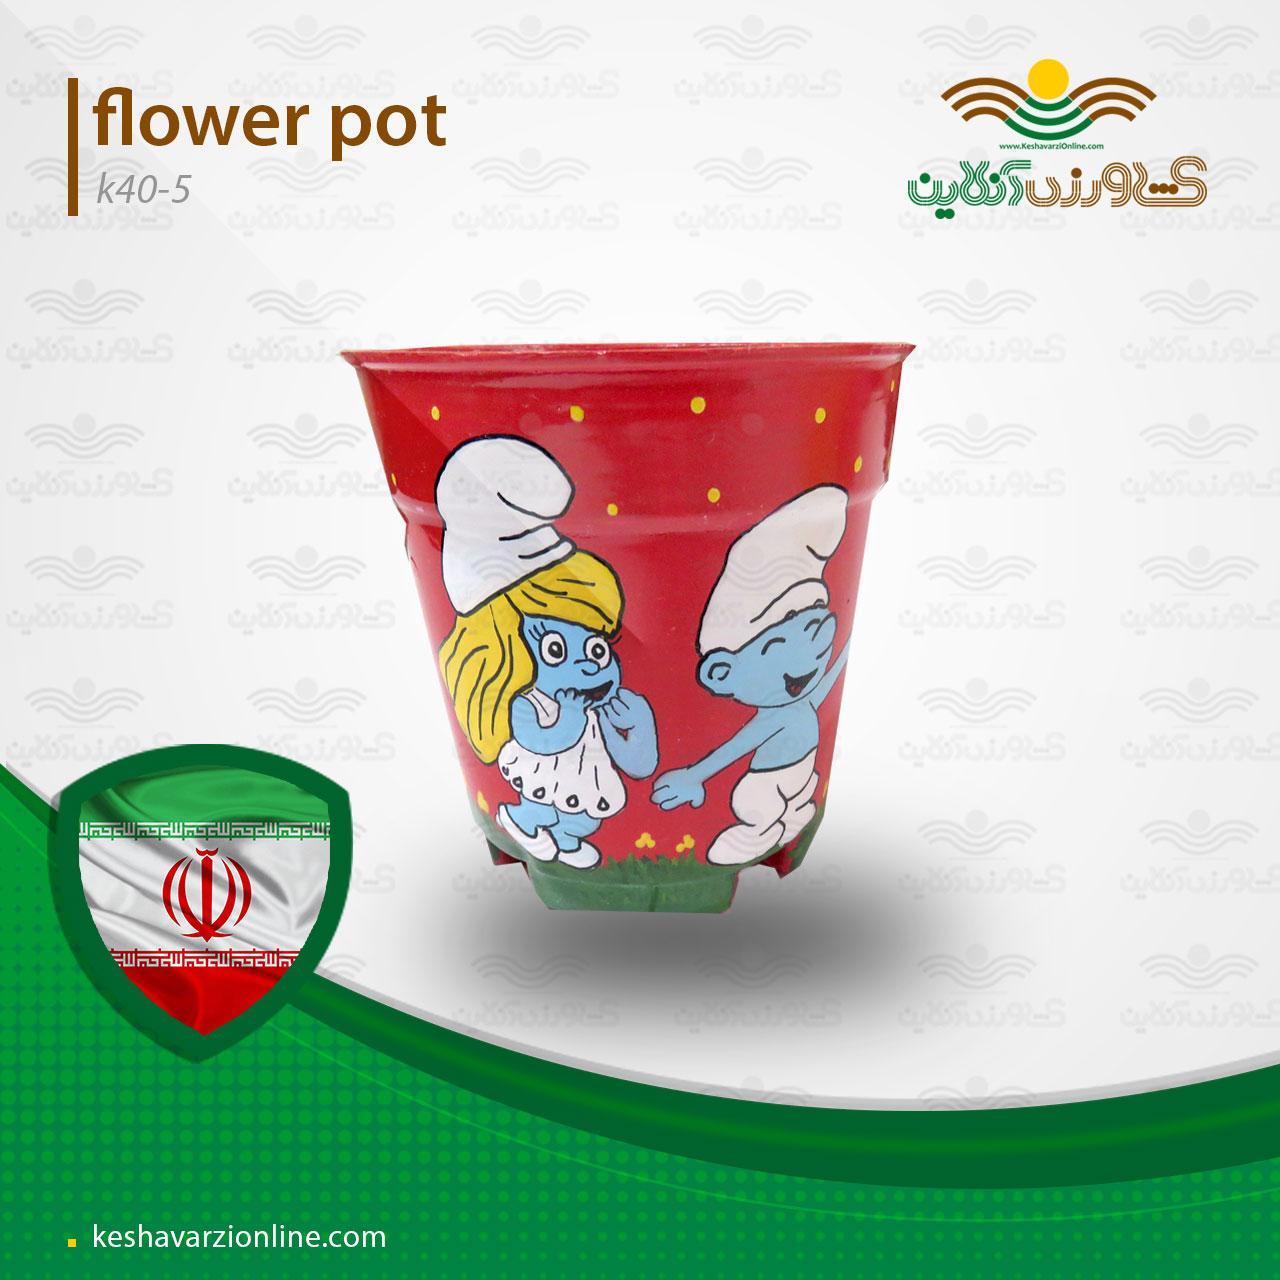 گلدان دکوری K40.5